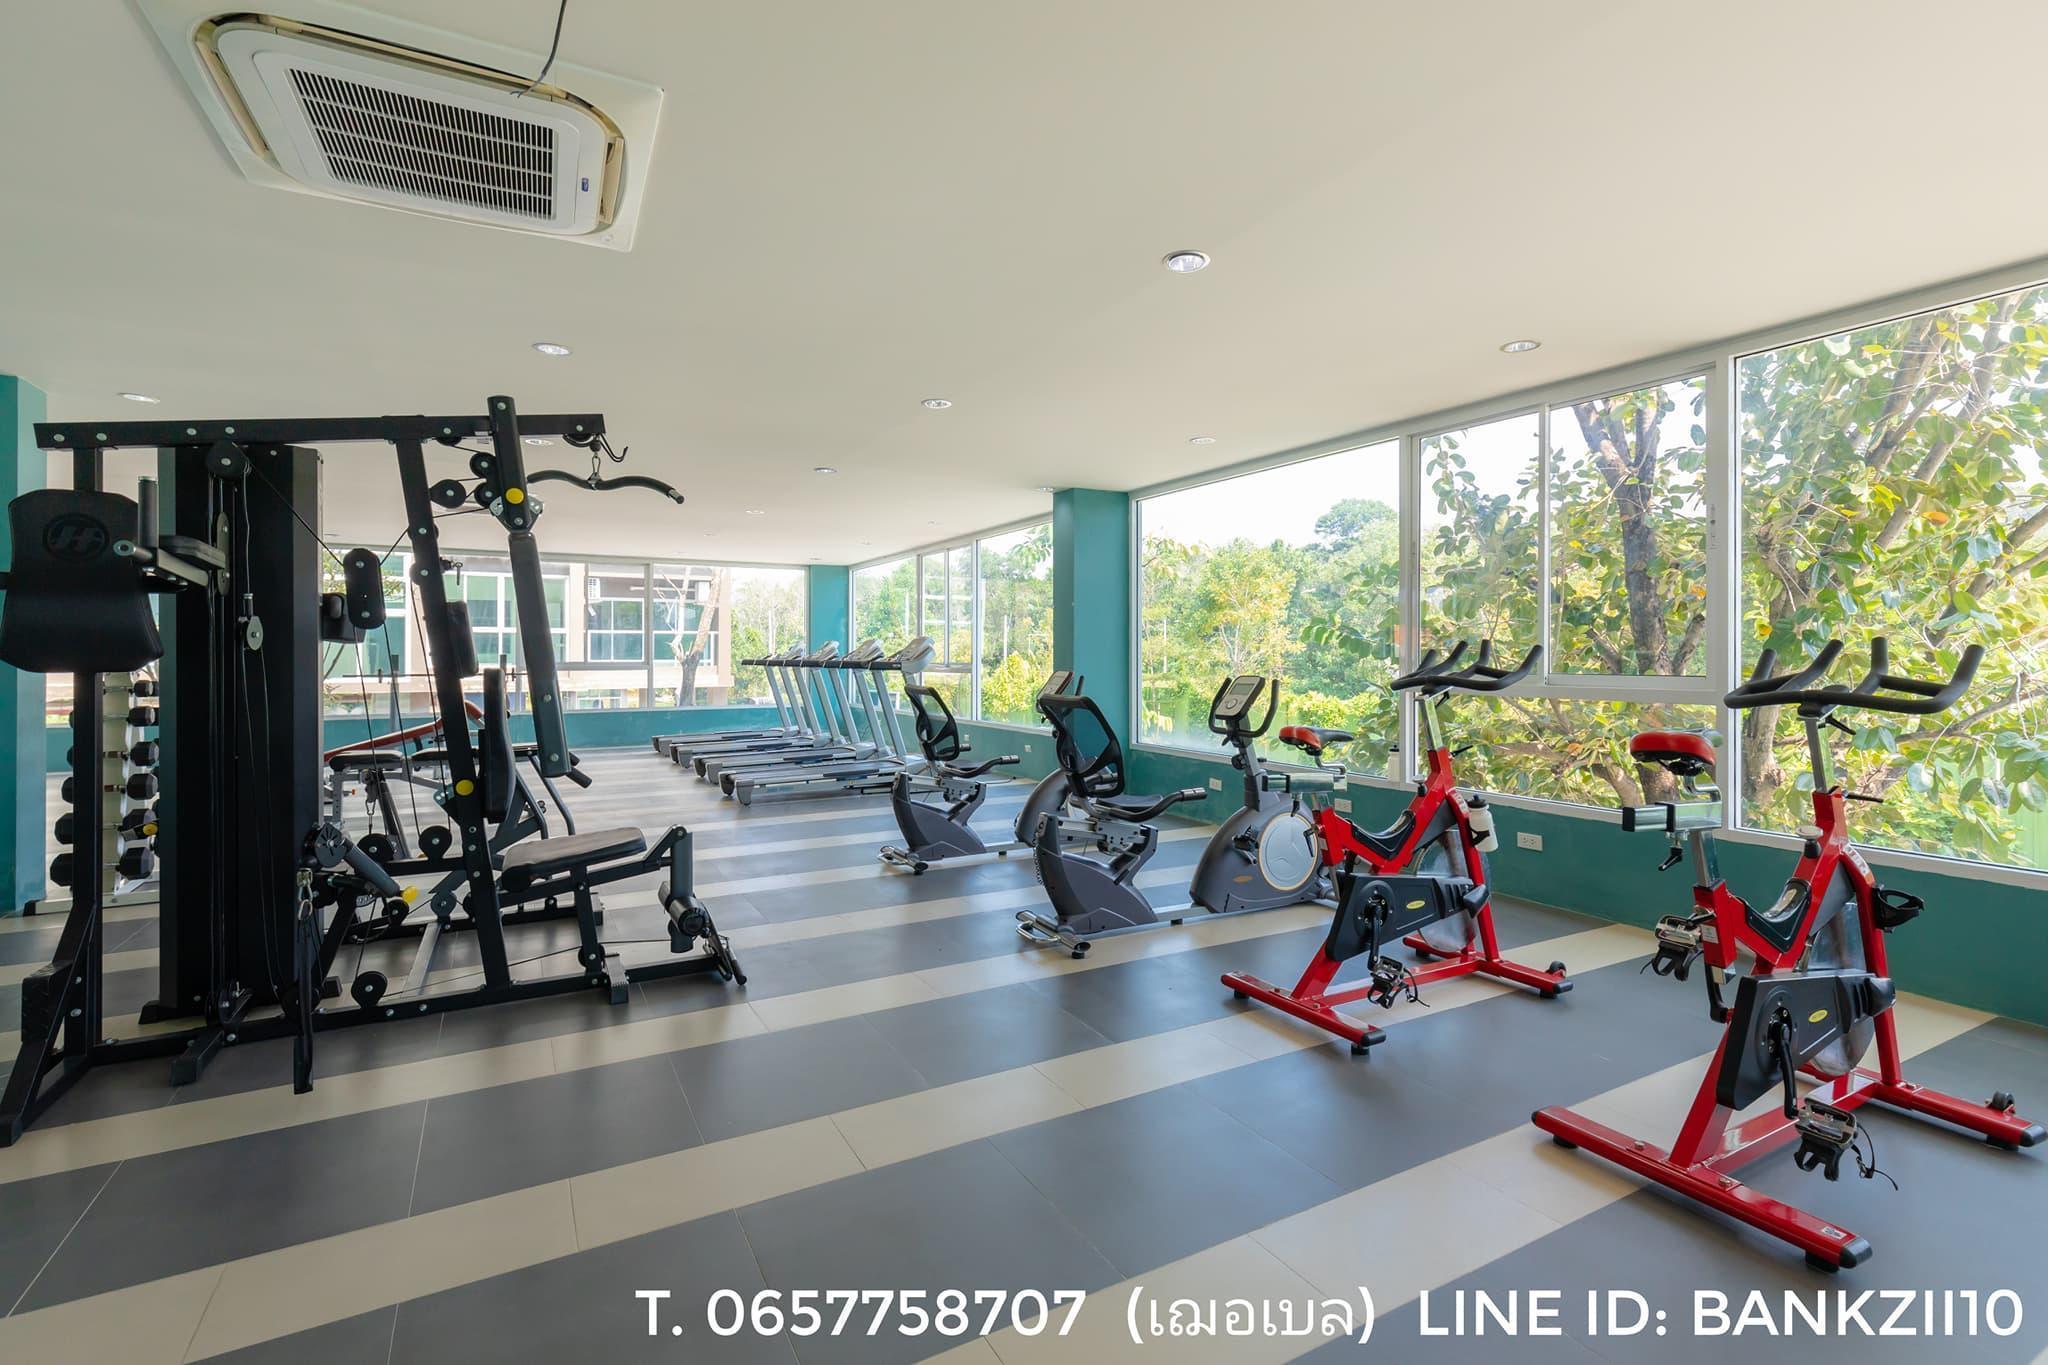 JJ airport phuket Luxury Private condominium &Pool อพาร์ตเมนต์ 1 ห้องนอน 1 ห้องน้ำส่วนตัว ขนาด 41 ตร.ม. – สนามบินภูเก็ต